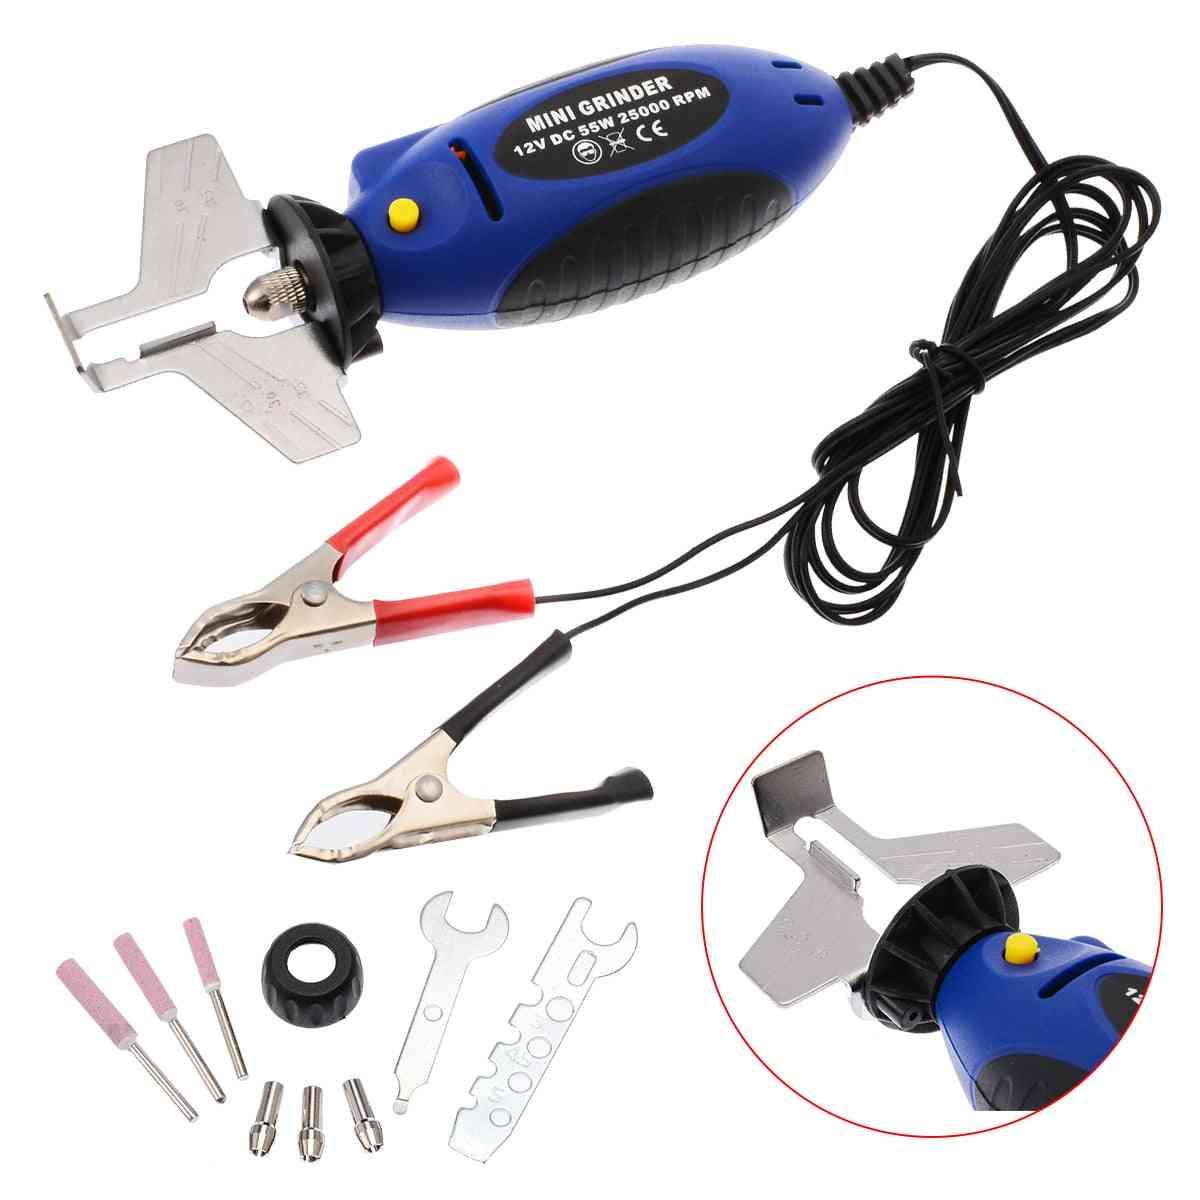 Chainsaw Sharpener Electric Grinder File Pro Tools Set